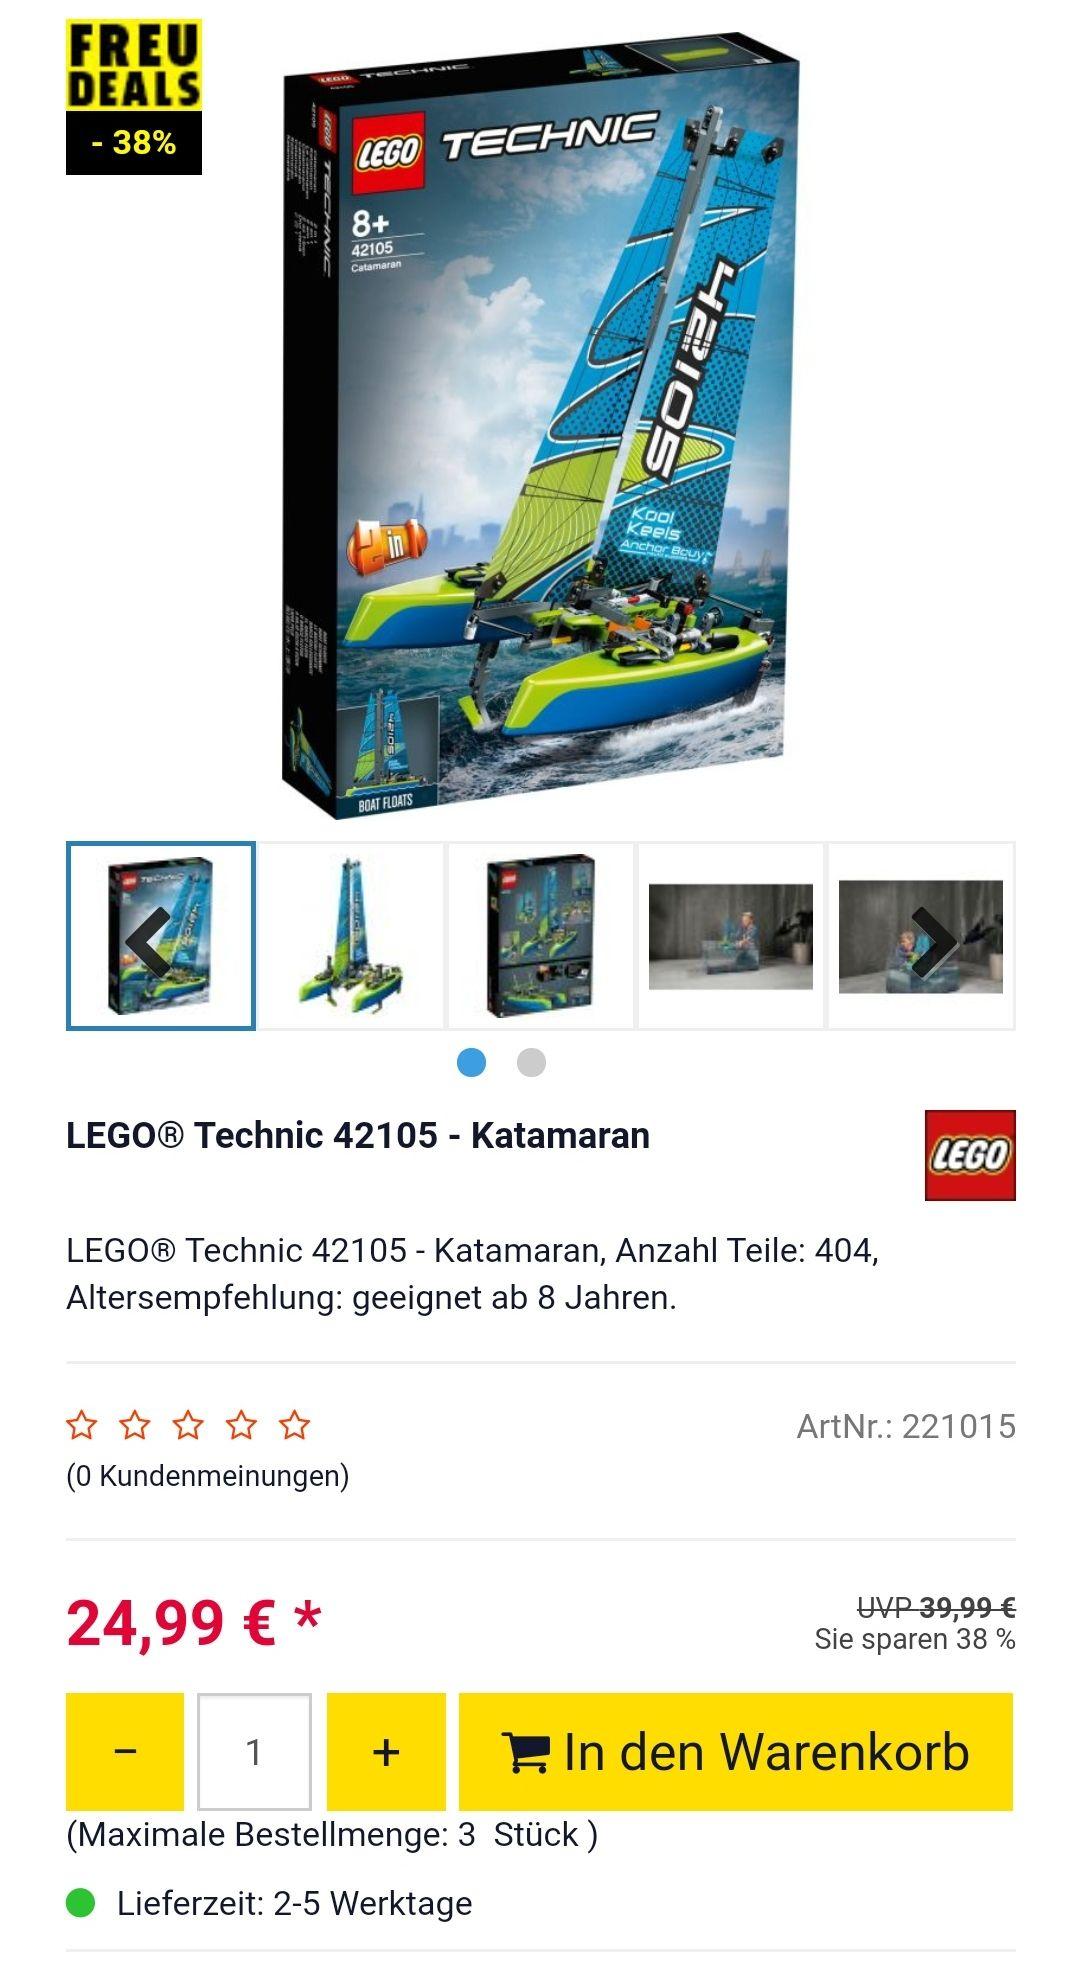 Lego Technic 42105 - Katamaran